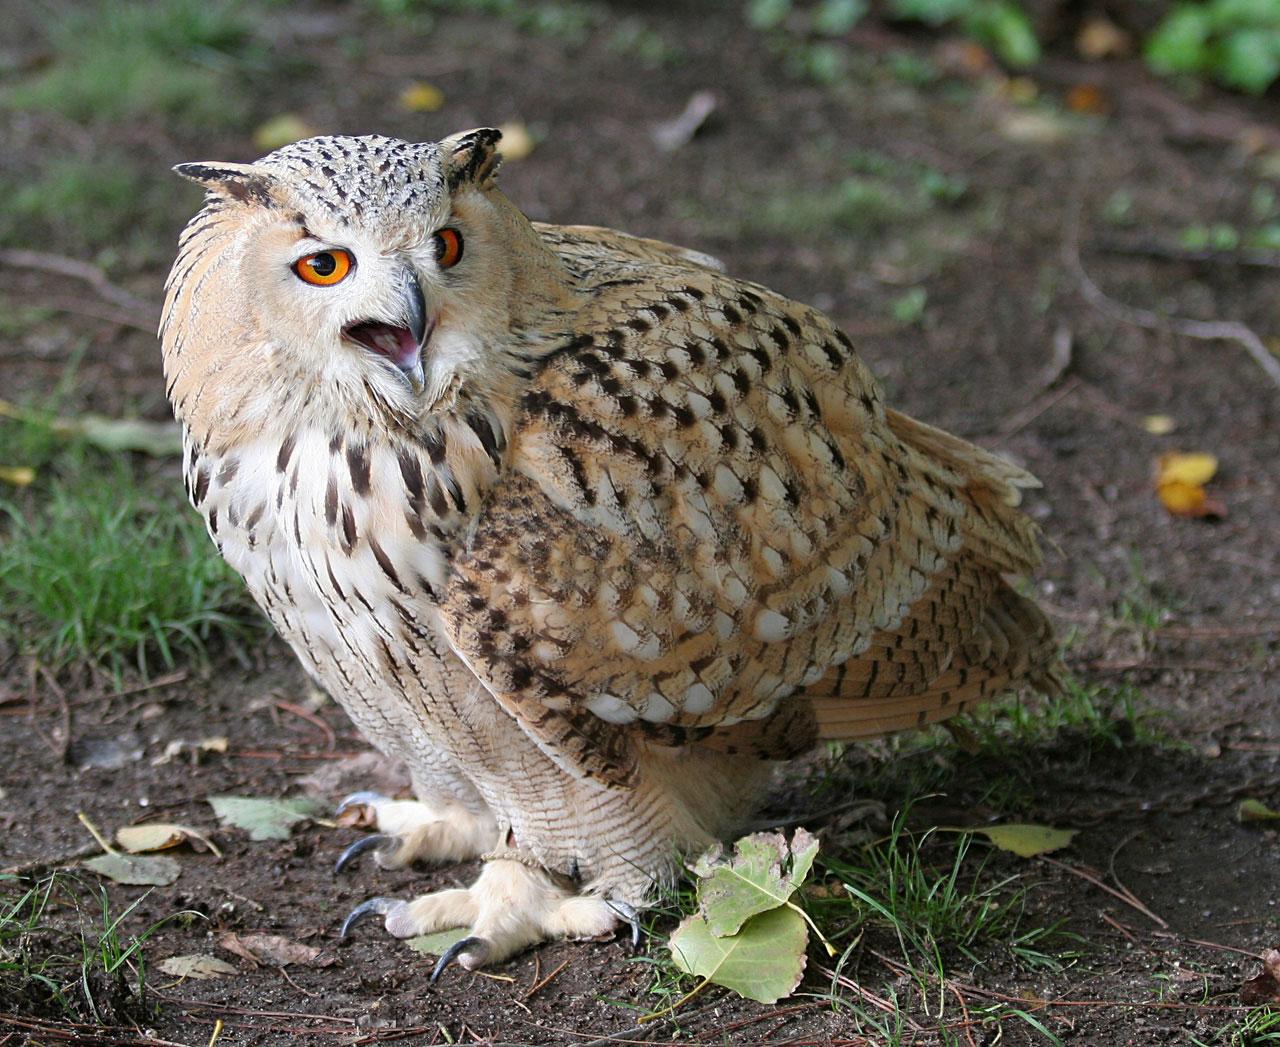 fotos de animales por un exelente fotografo